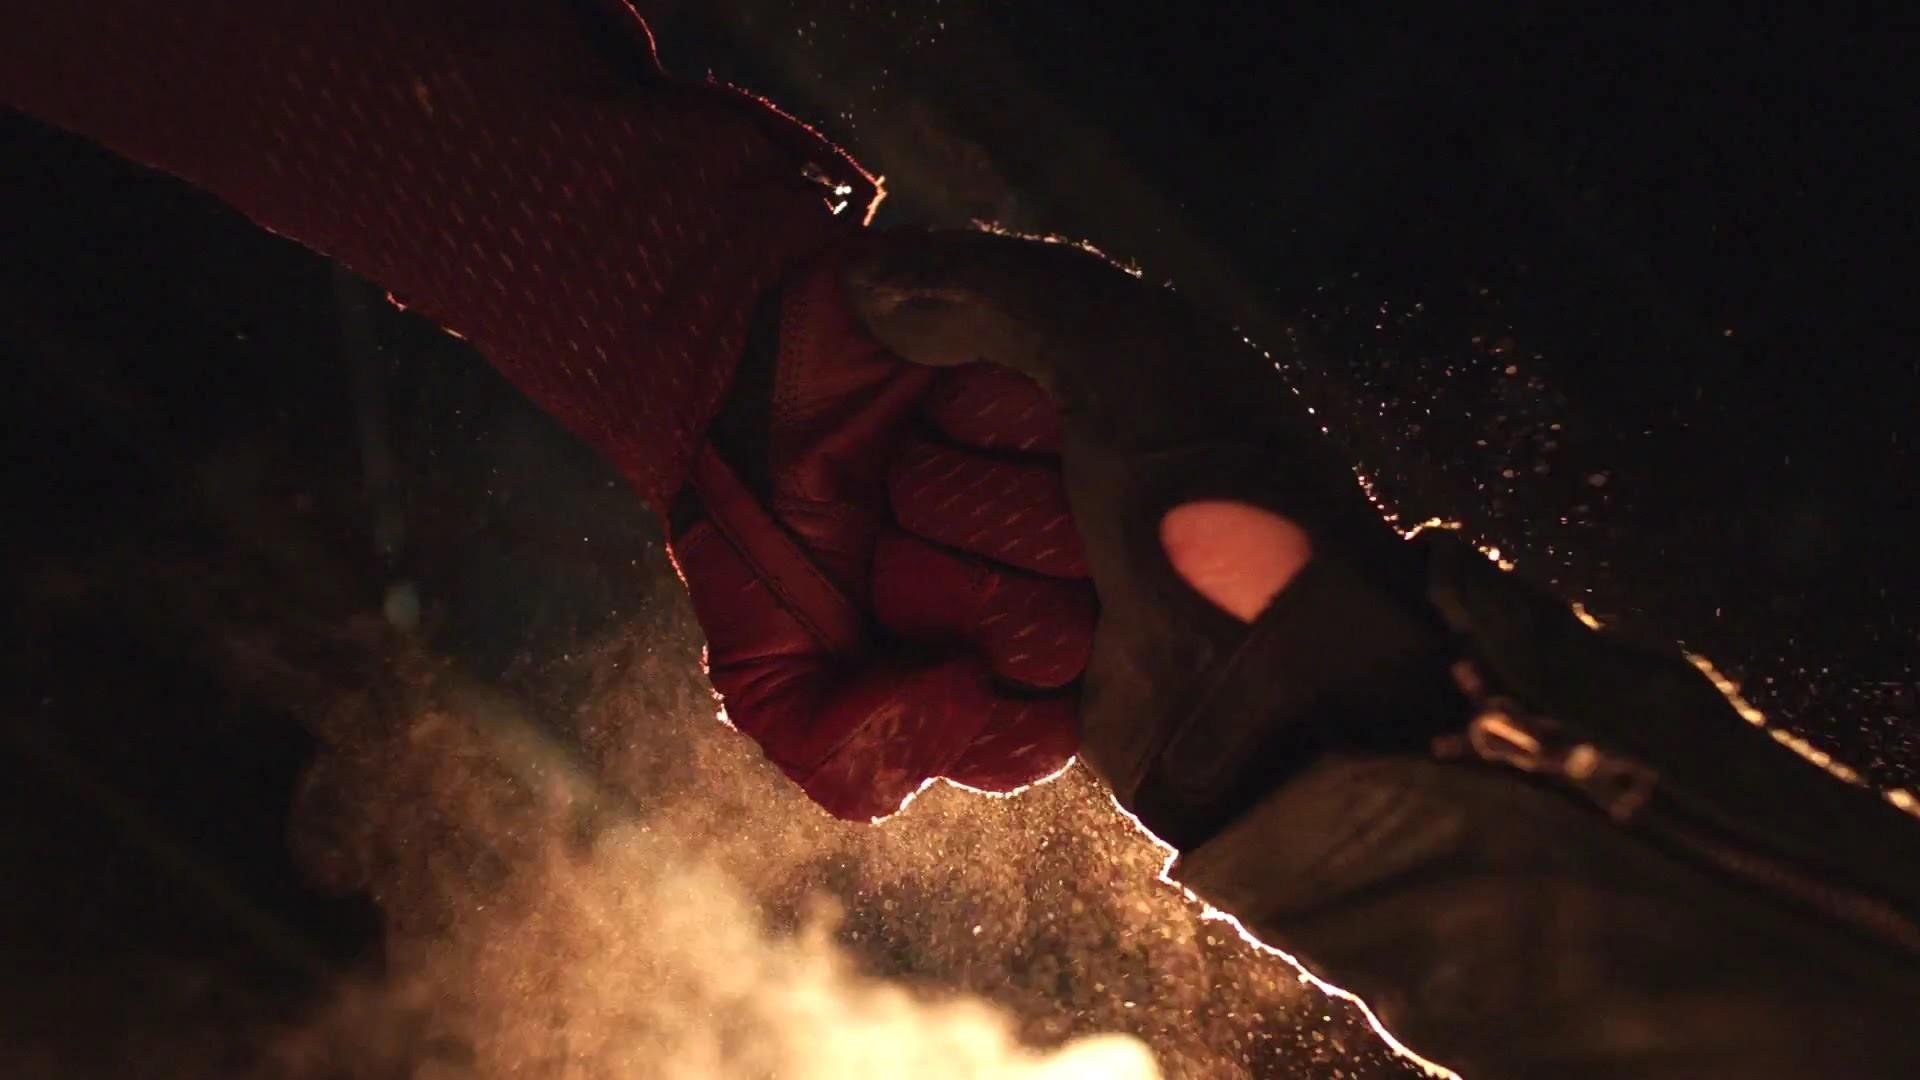 The Flash – Flash vs Arrow Trailer – YouTube